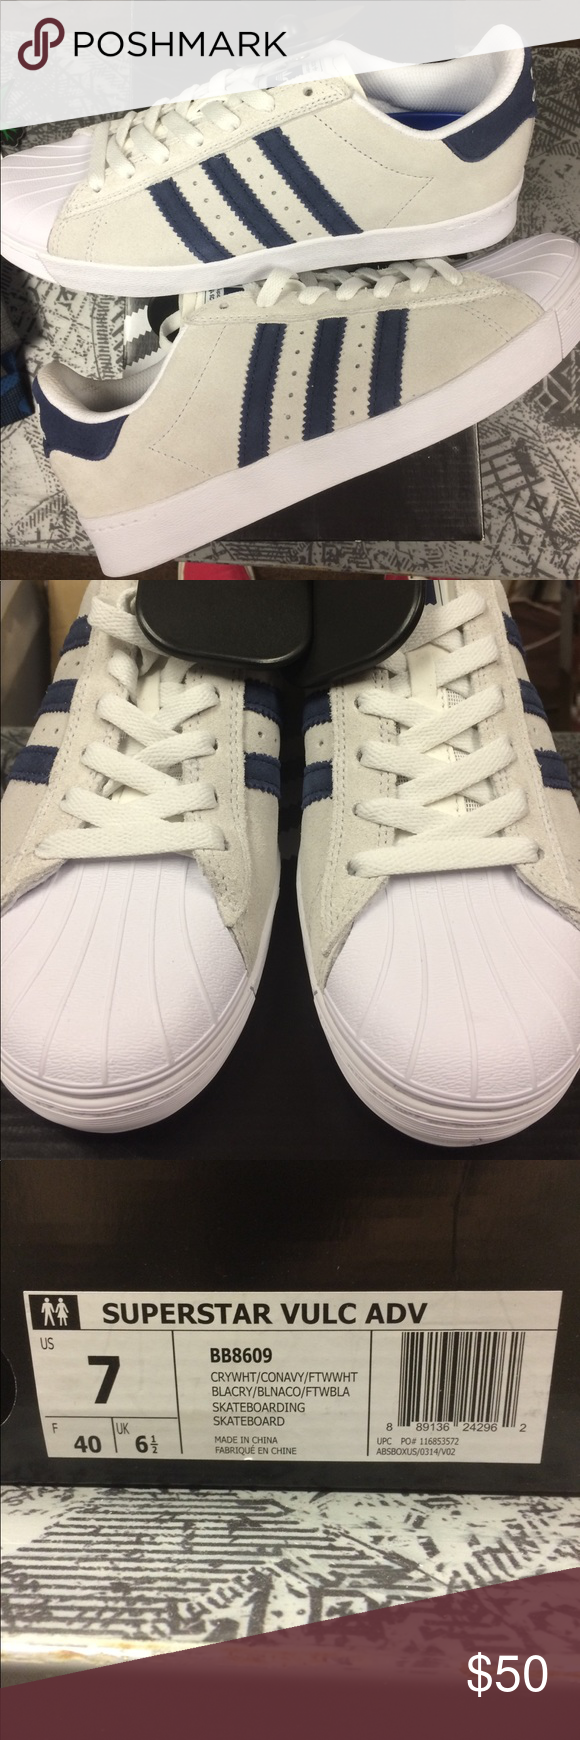 Adidas shell la superstar nwt marina strisce adidas e shell